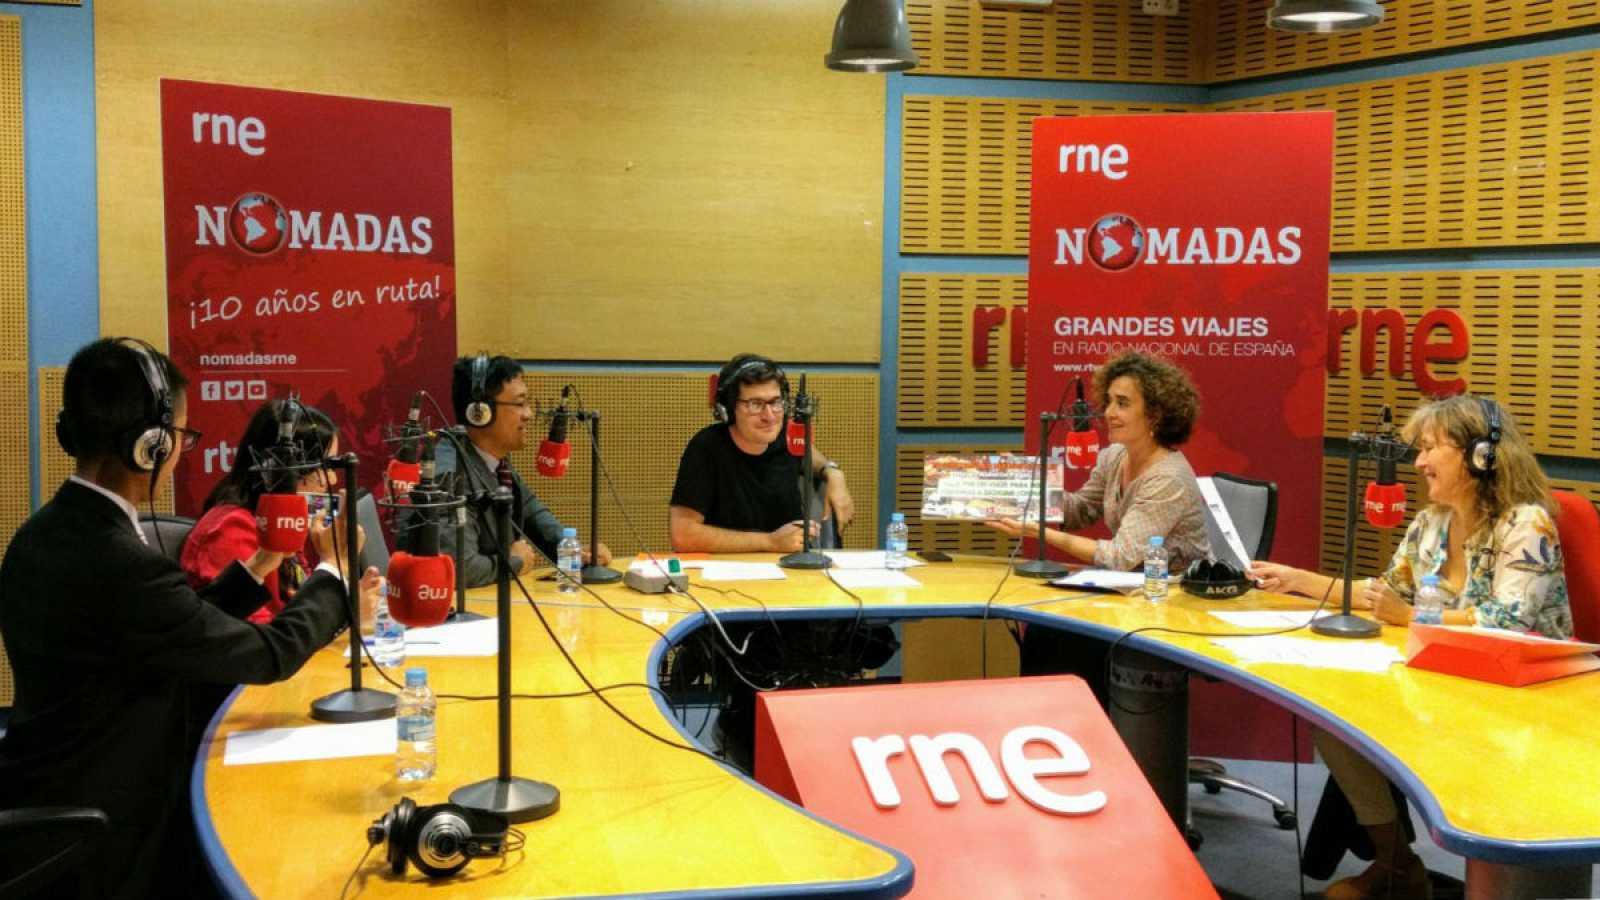 Nómadas - Concurso de diarios de viaje 2017 - 15/10/17 - escuchar ahora